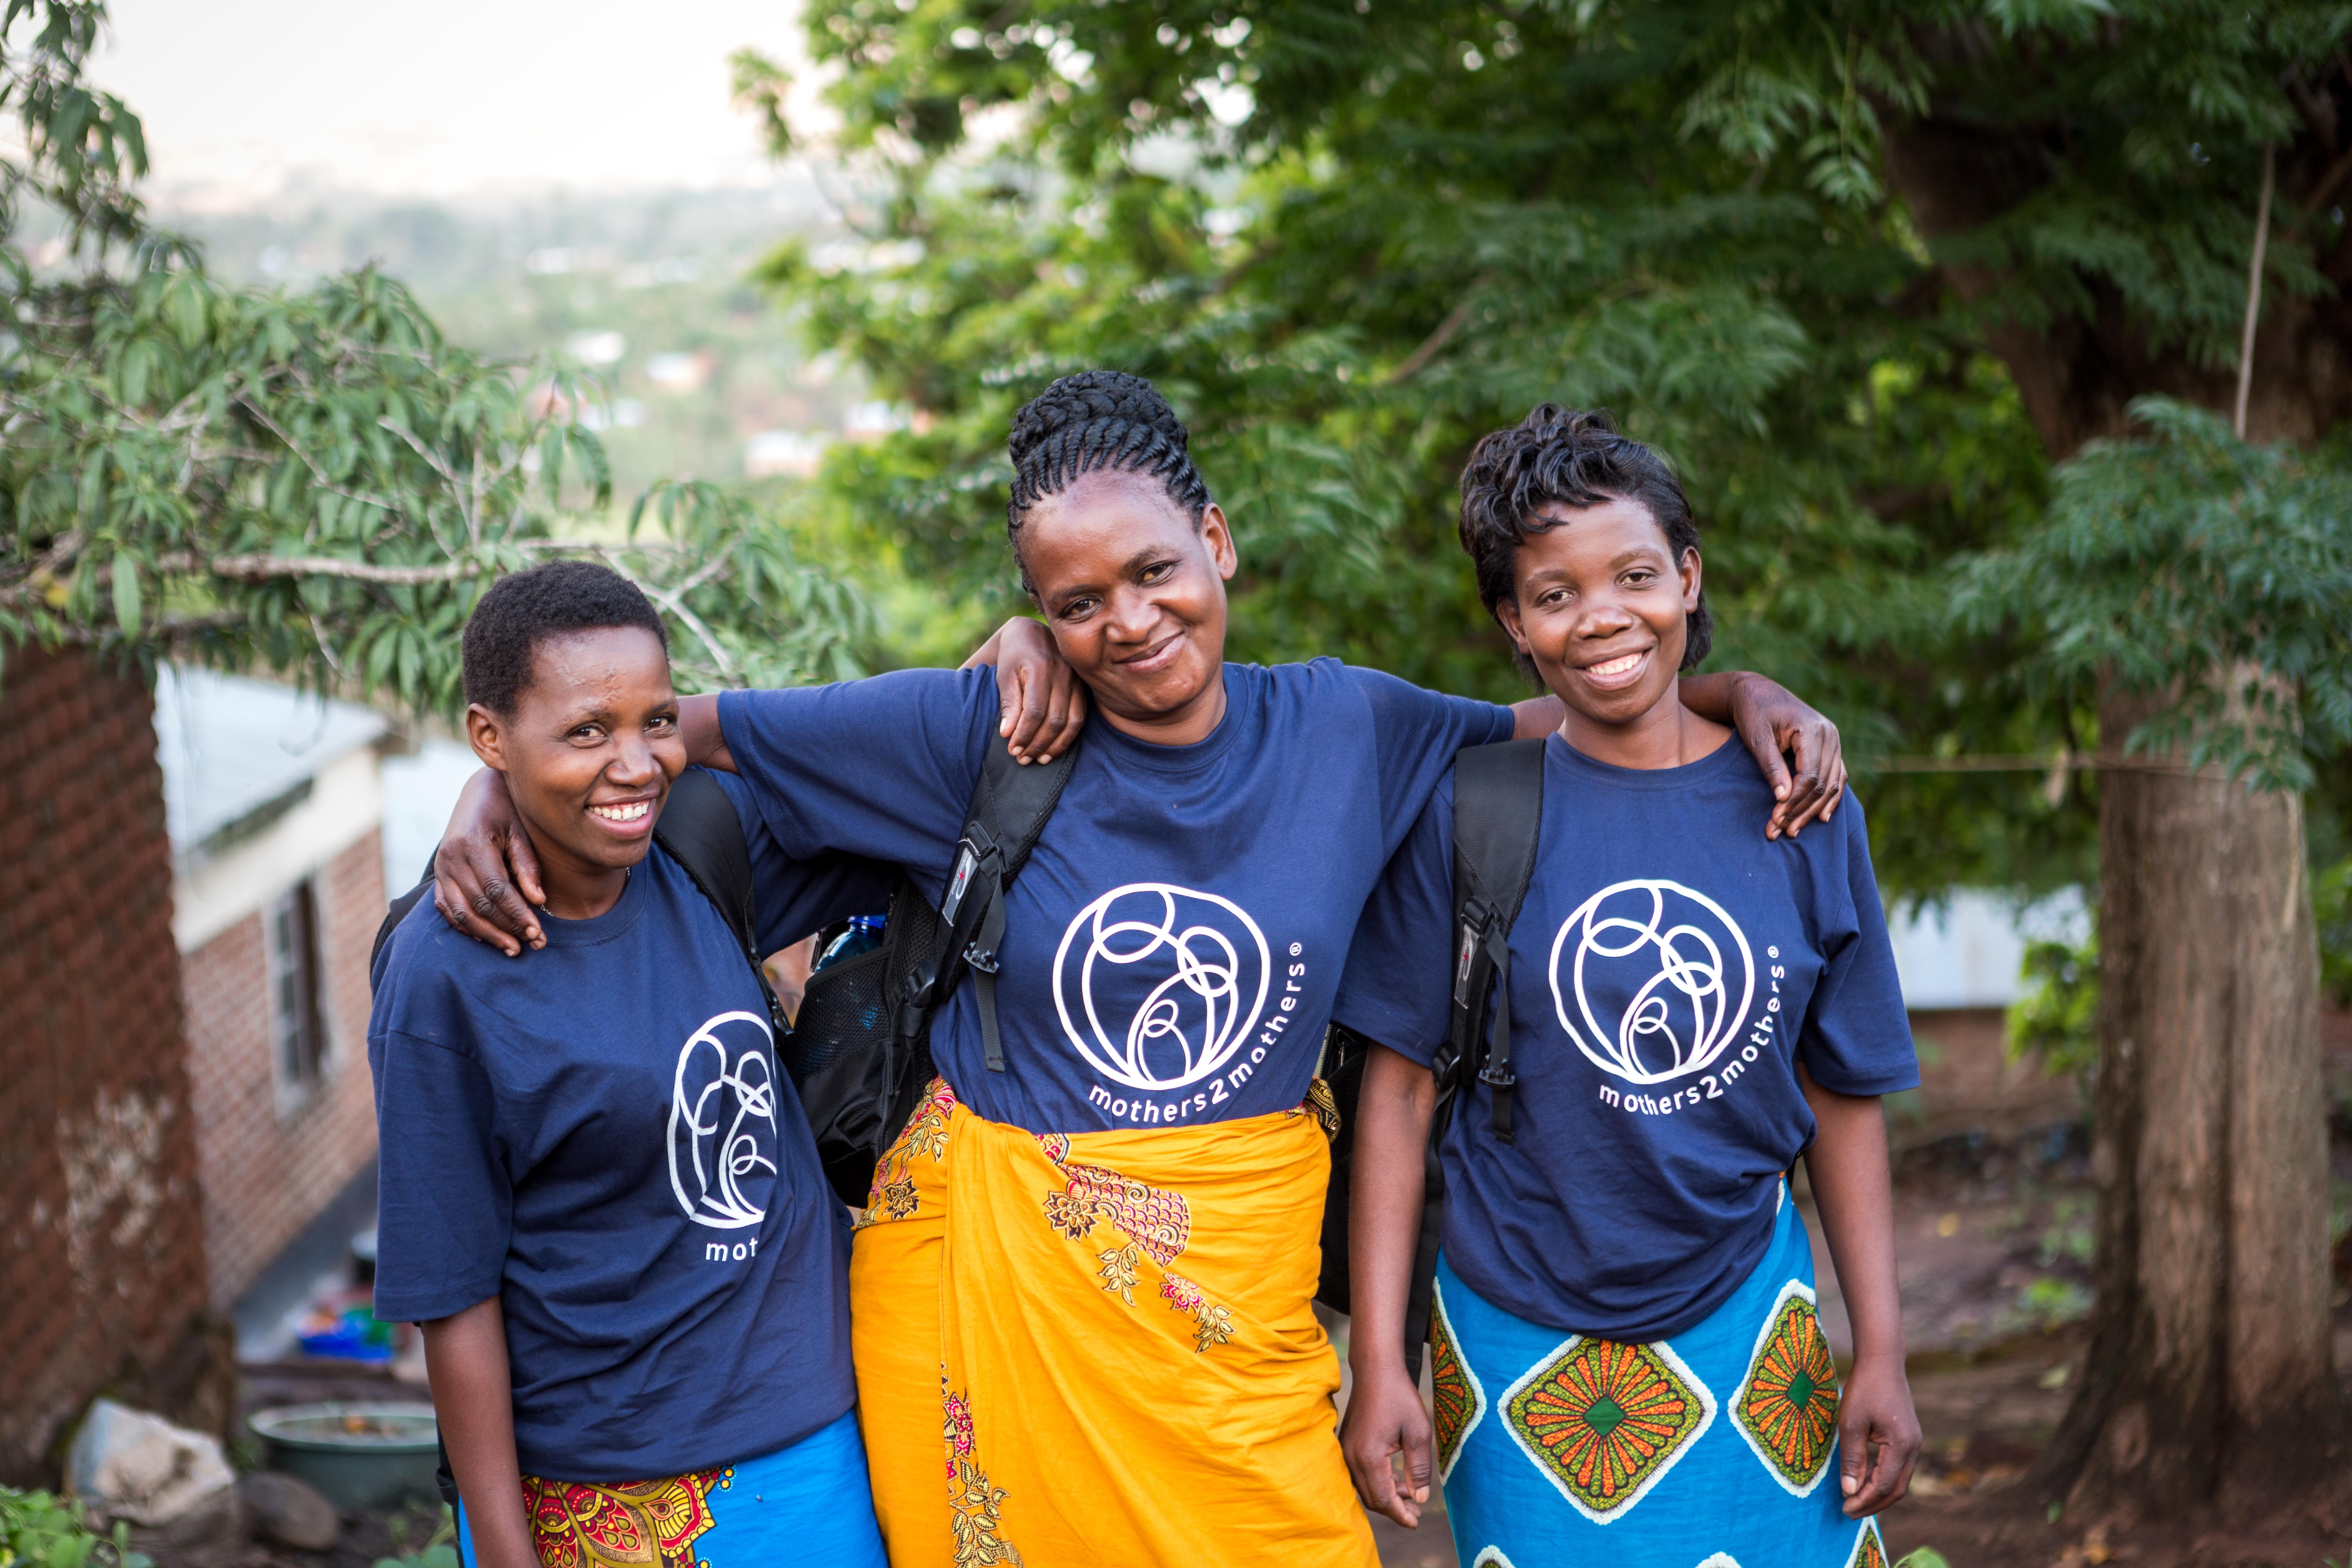 http://staging.skoll.org/wp-content/uploads/2014/03/Mentor-Mothers-Malawi.jpg